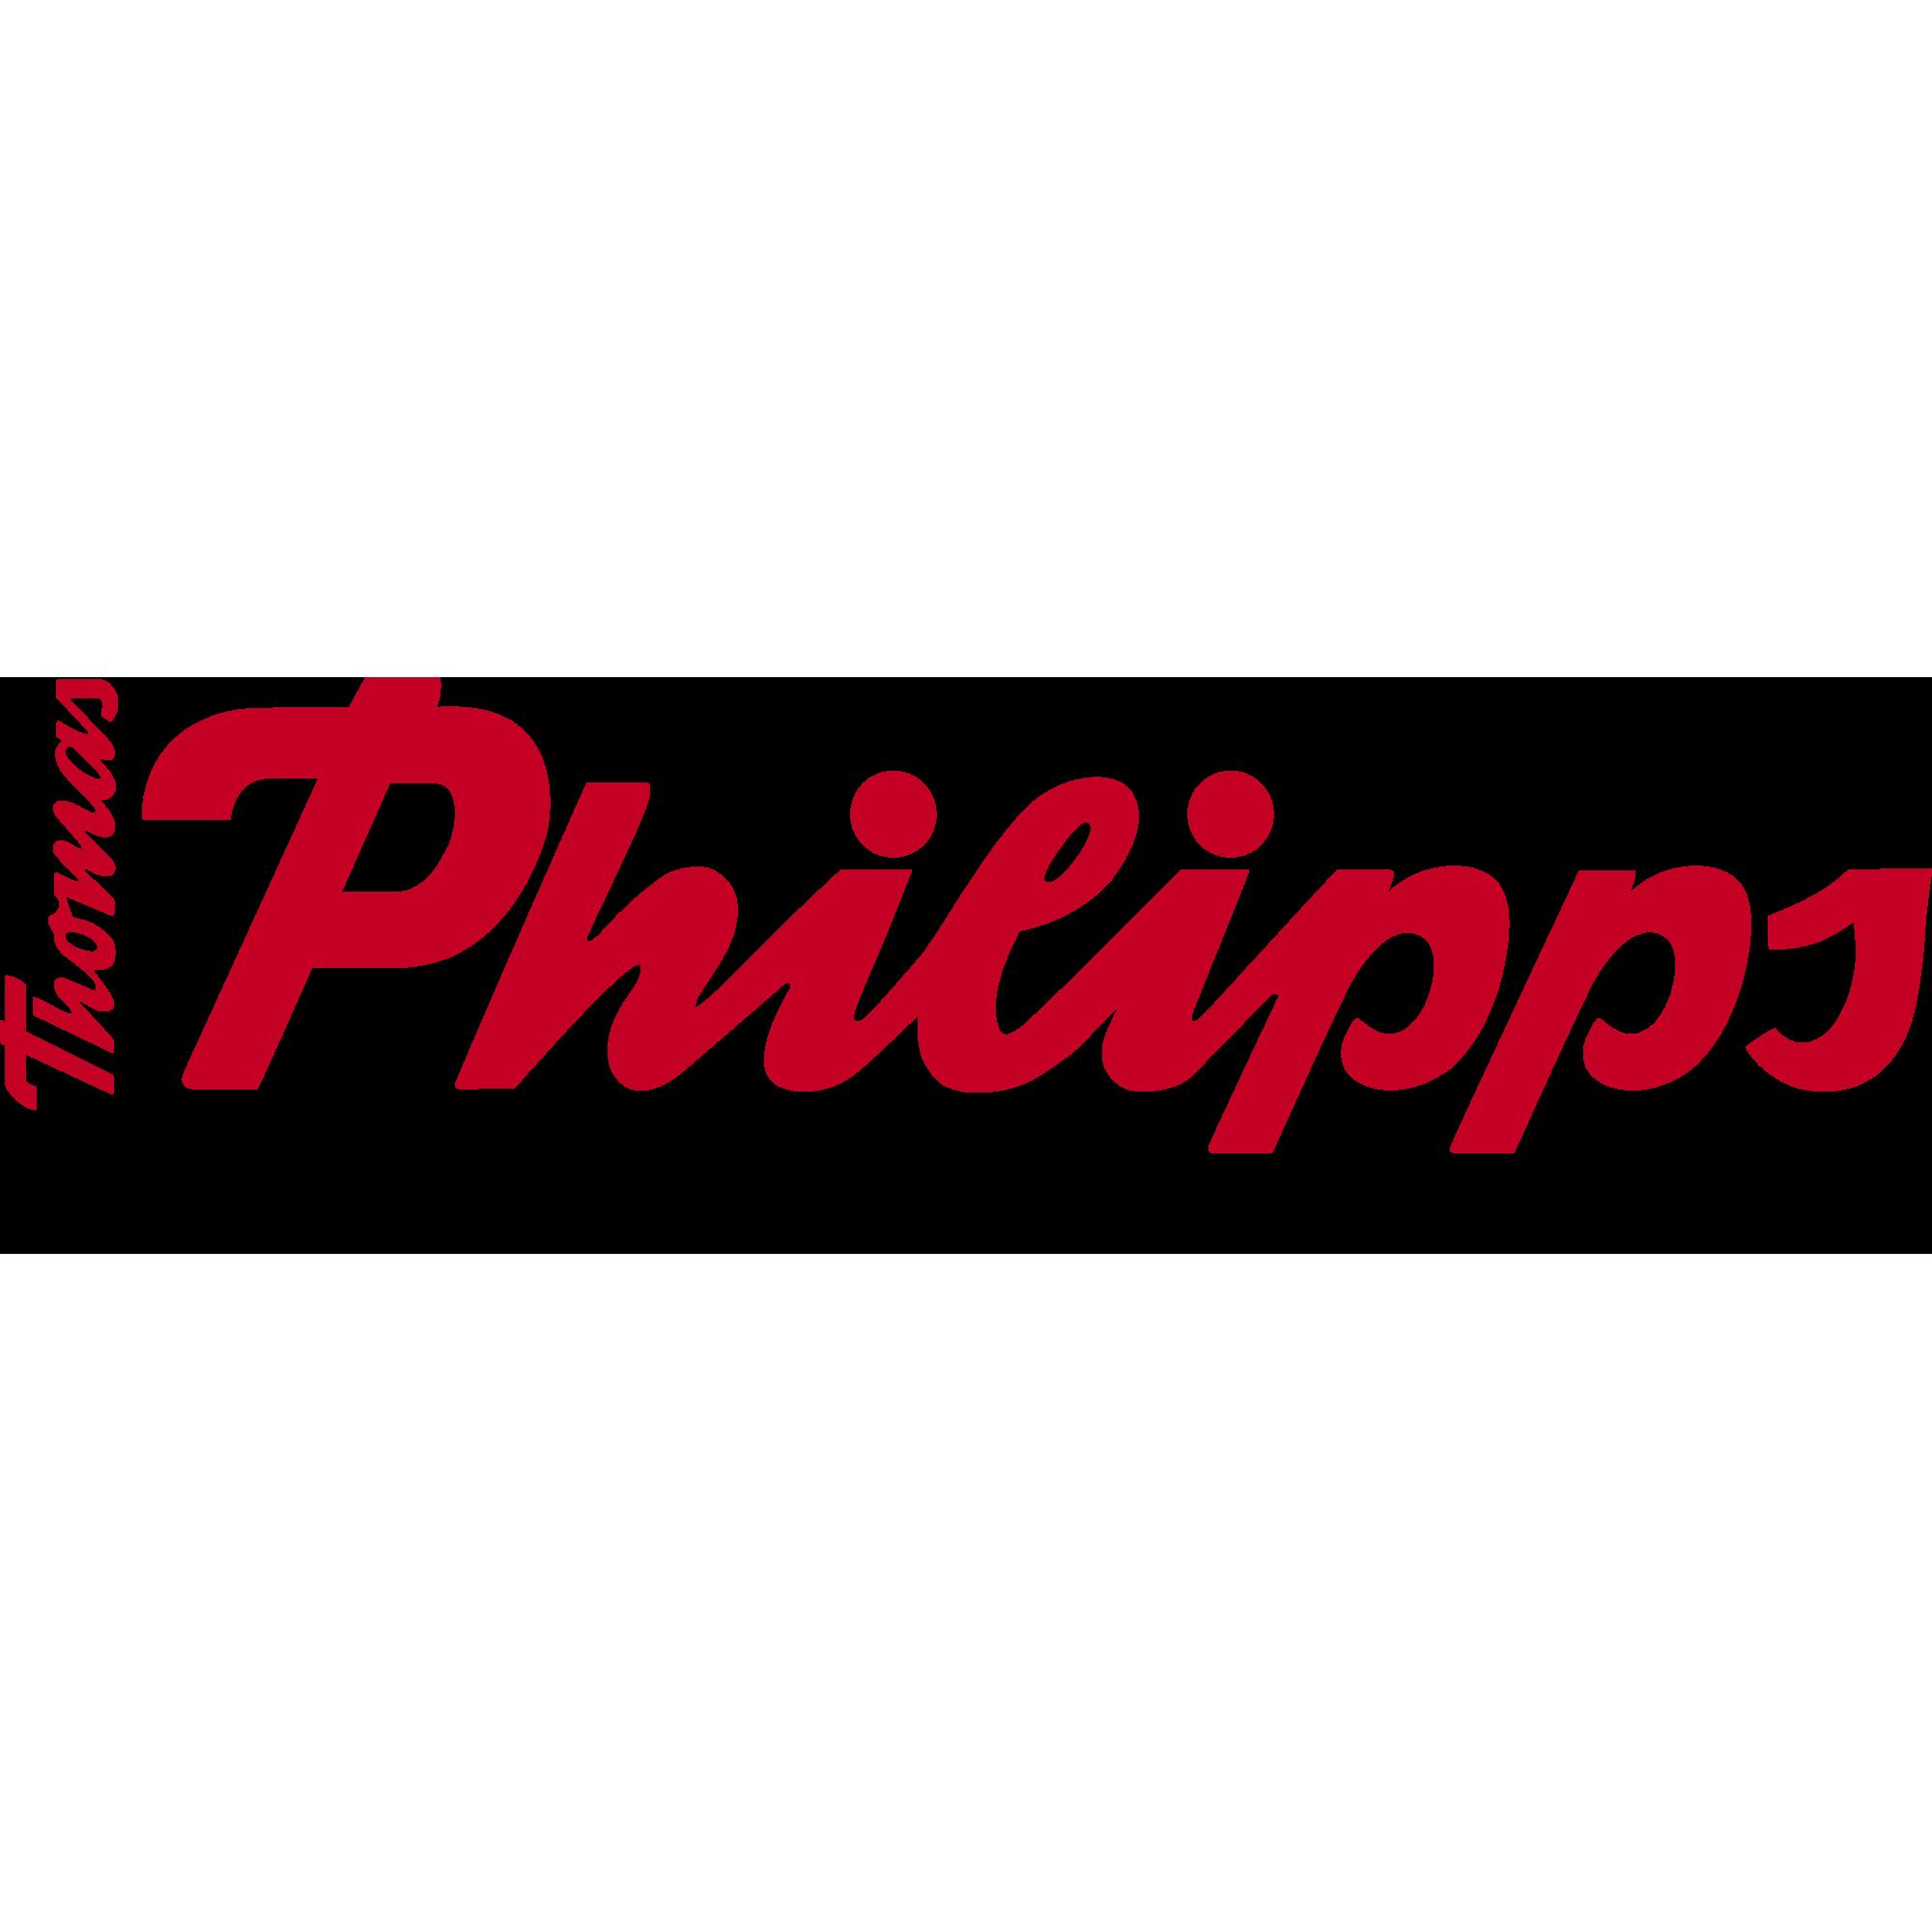 thomas philipps